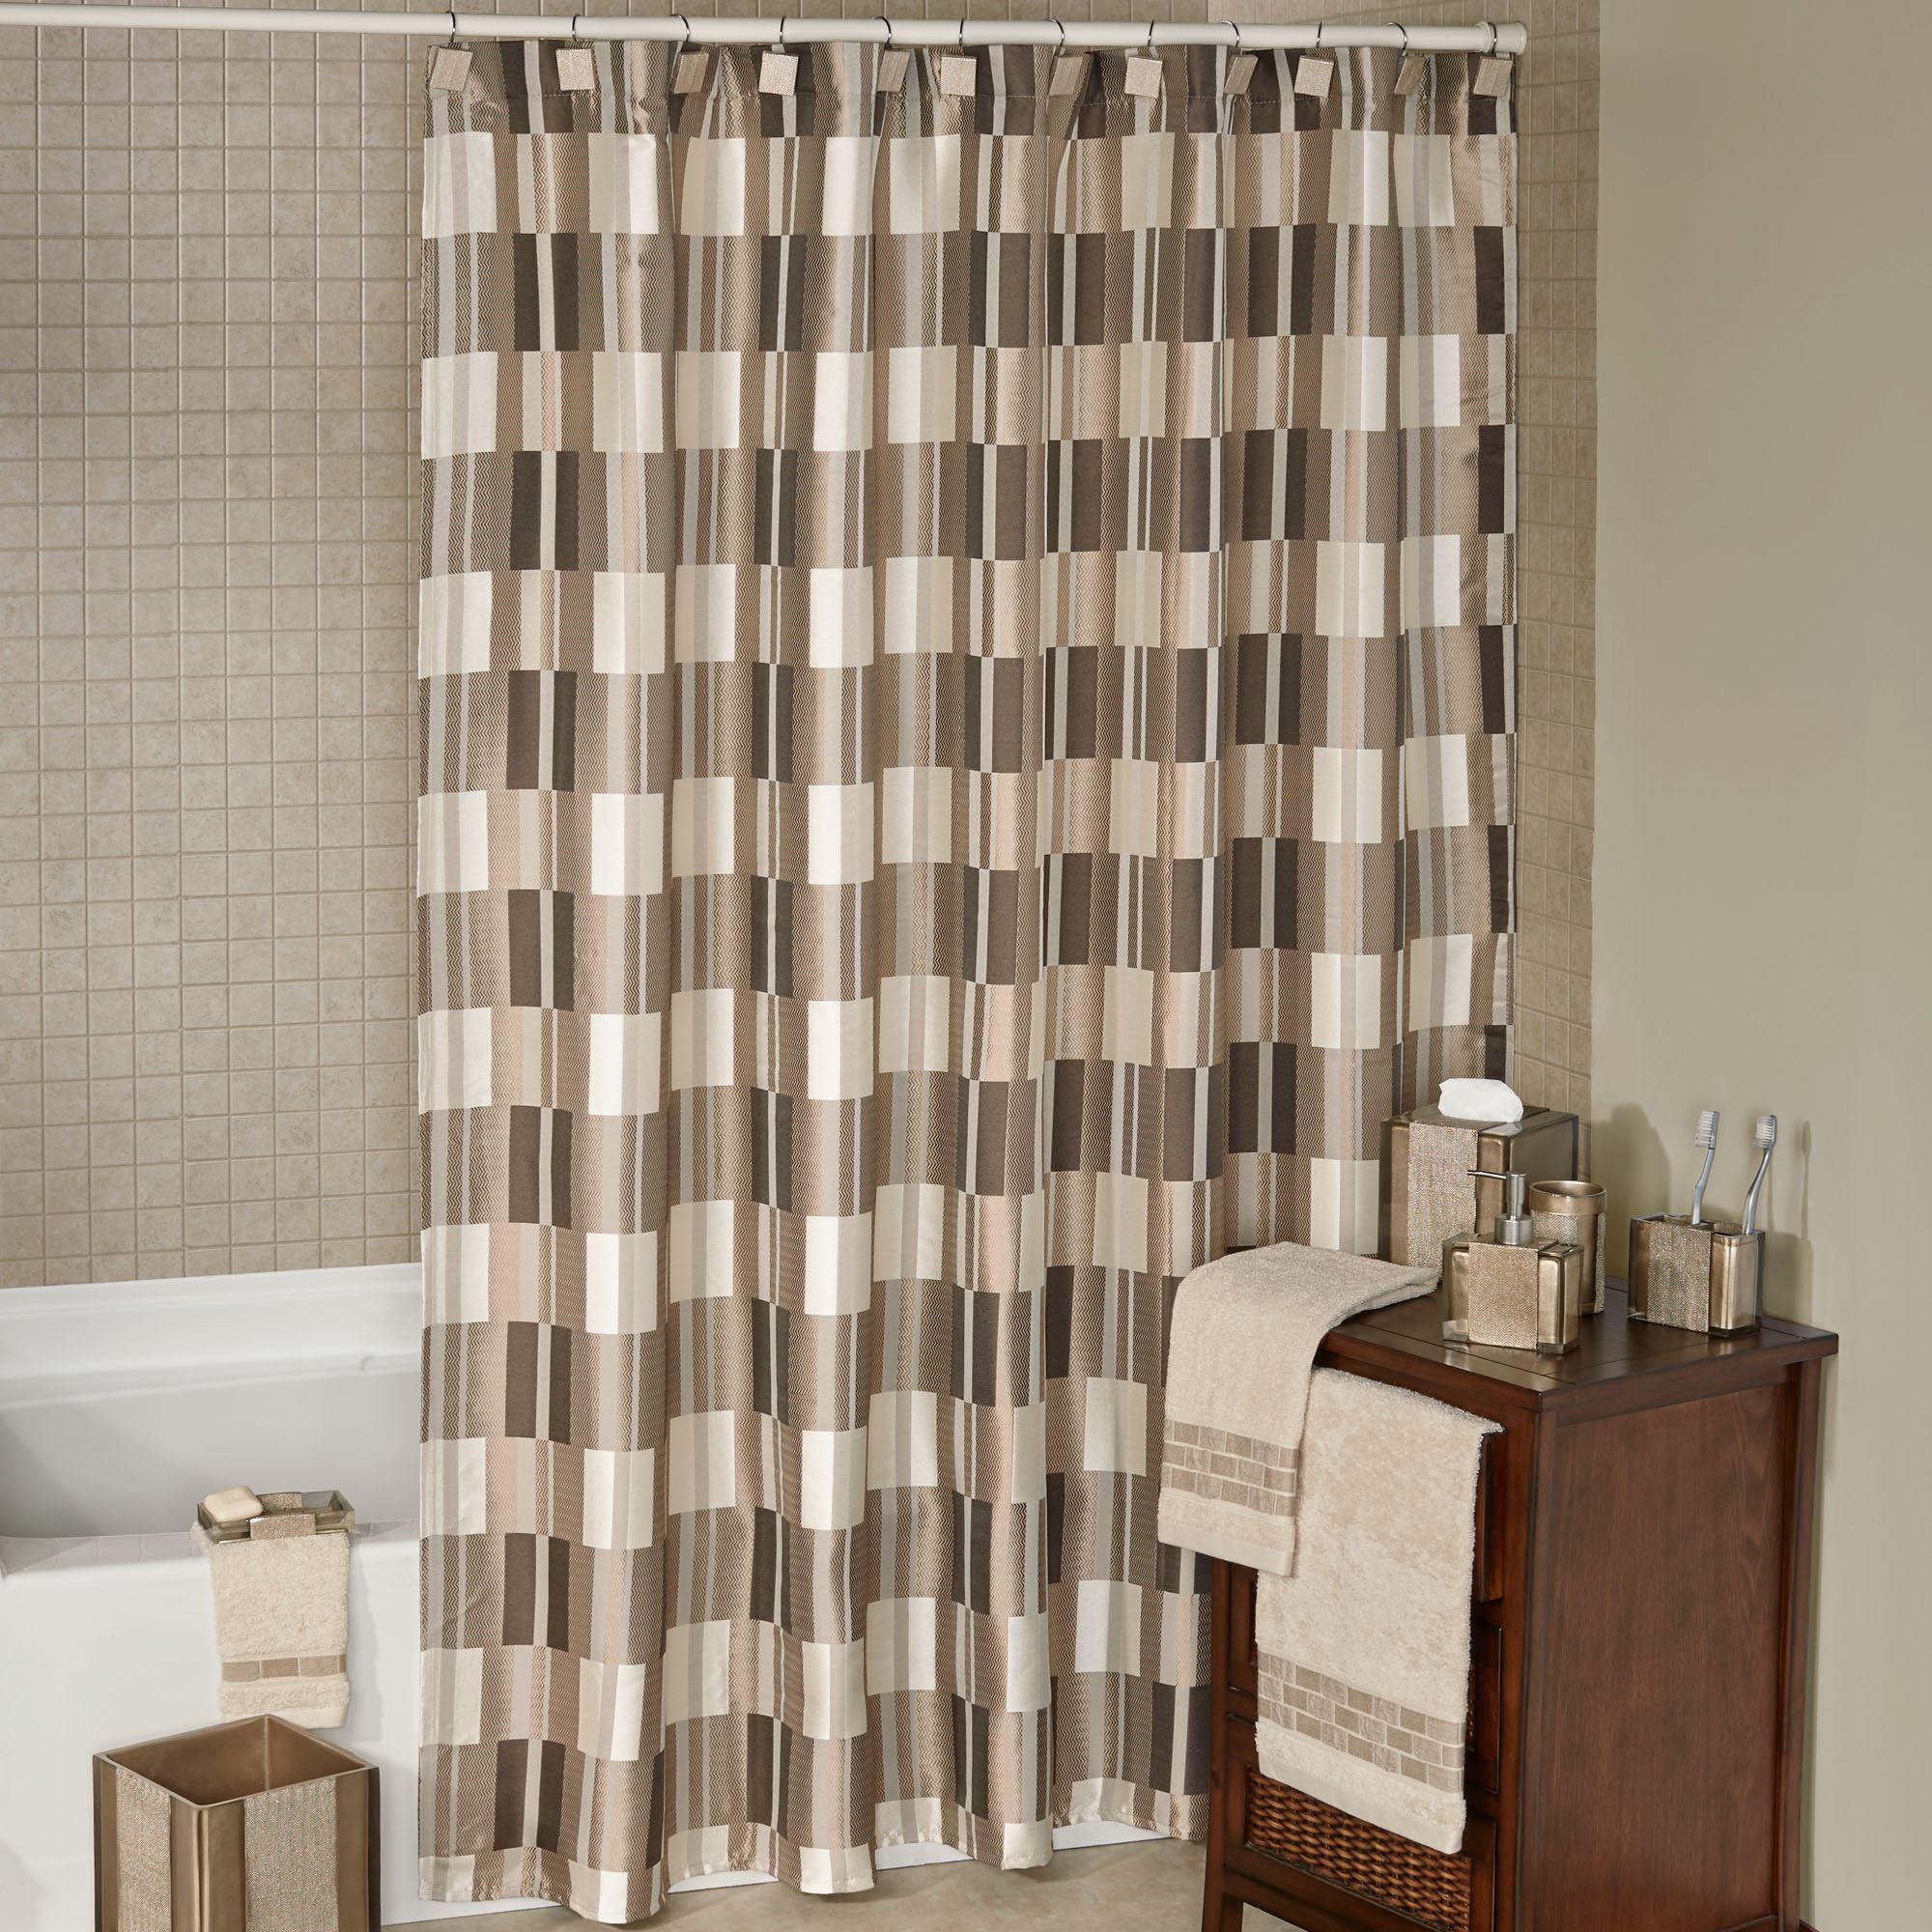 Birmingham Geometric Block Design Shower Curtain with Liner